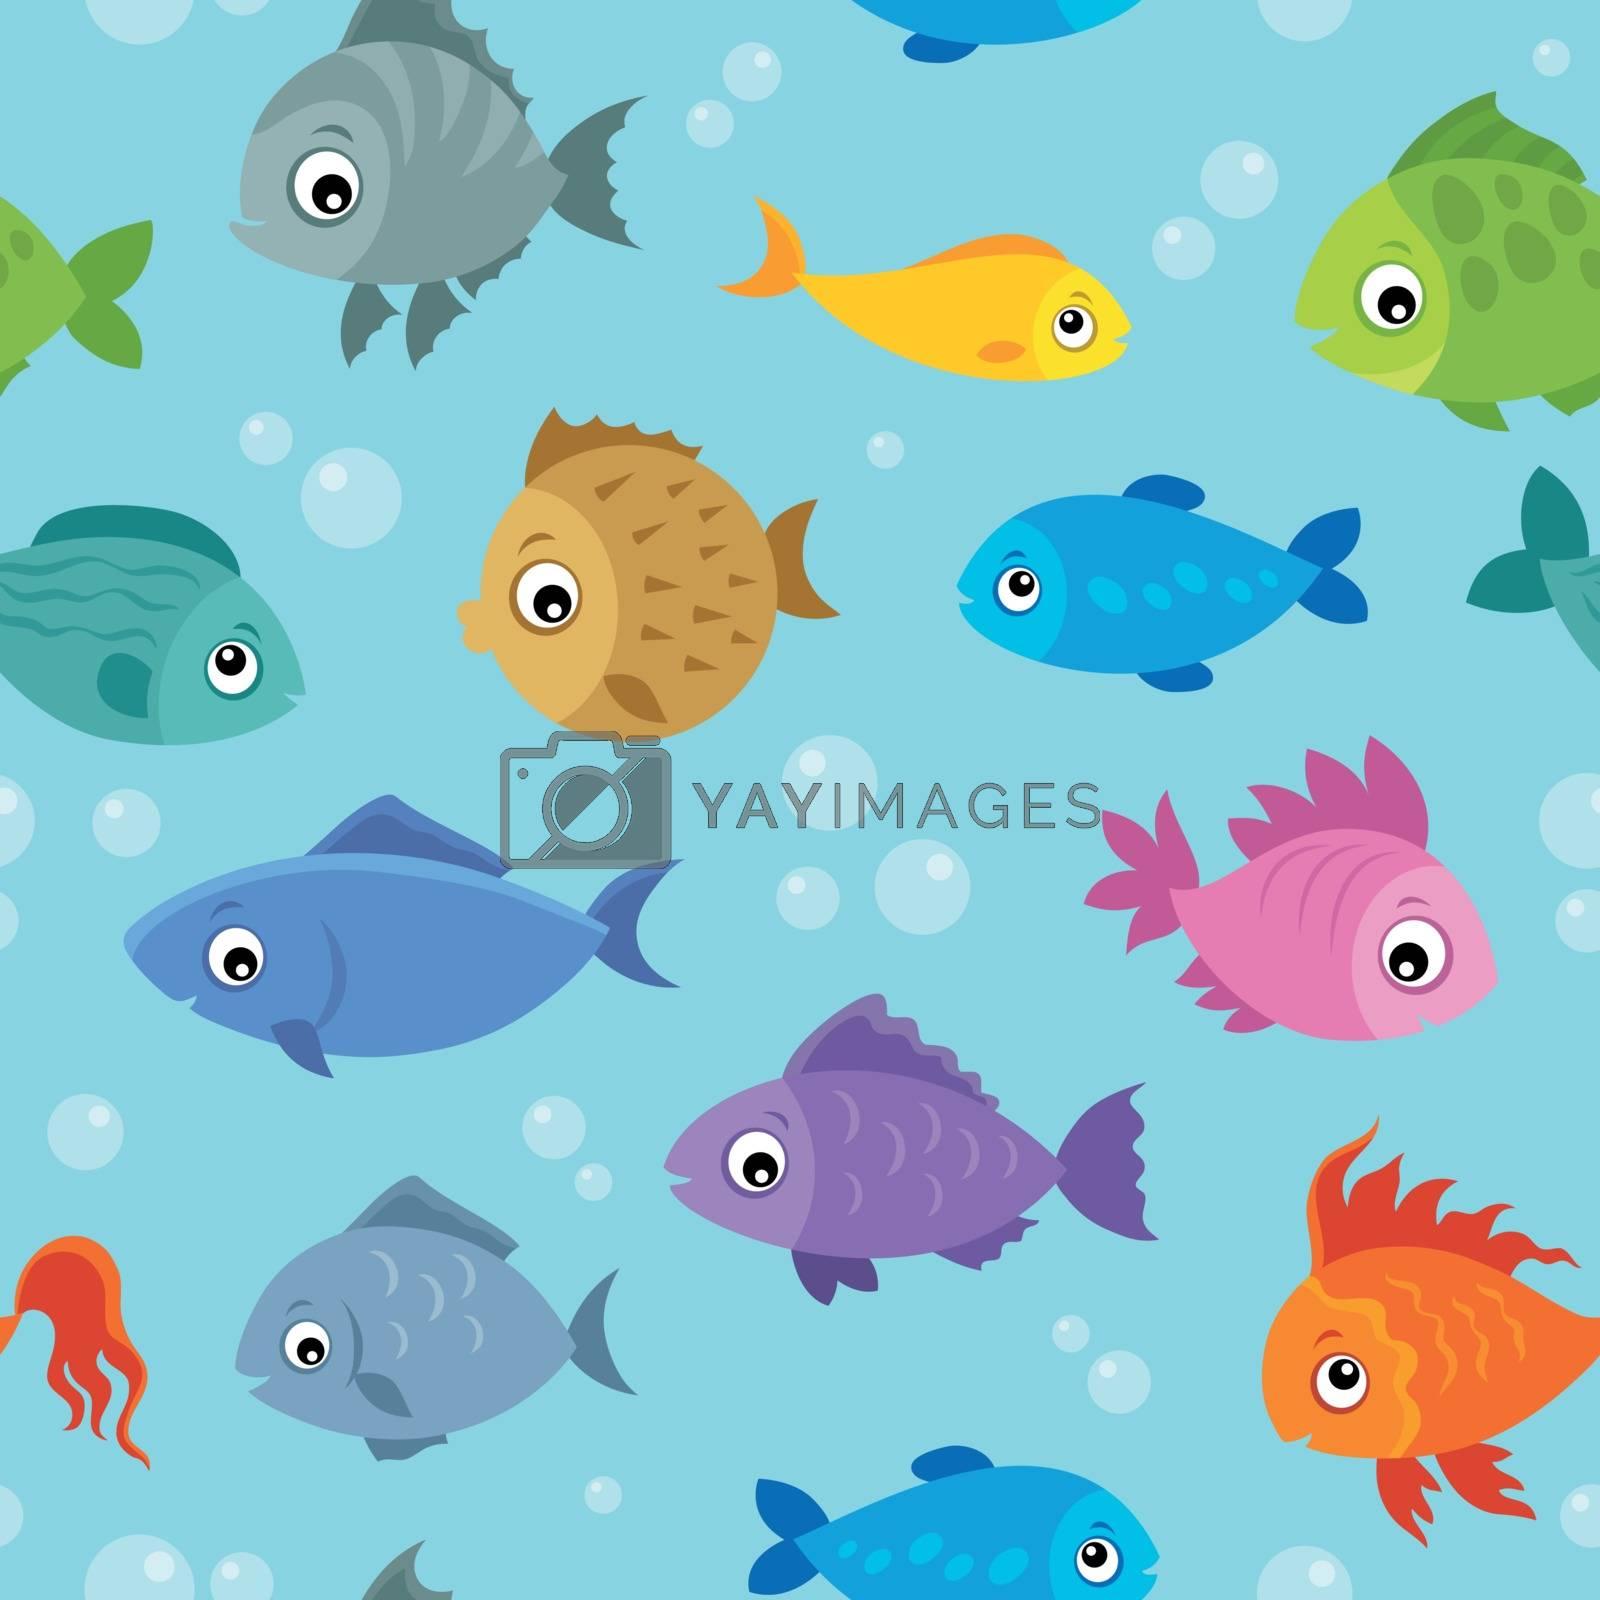 Seamless background stylized fishes 3 - eps10 vector illustration.